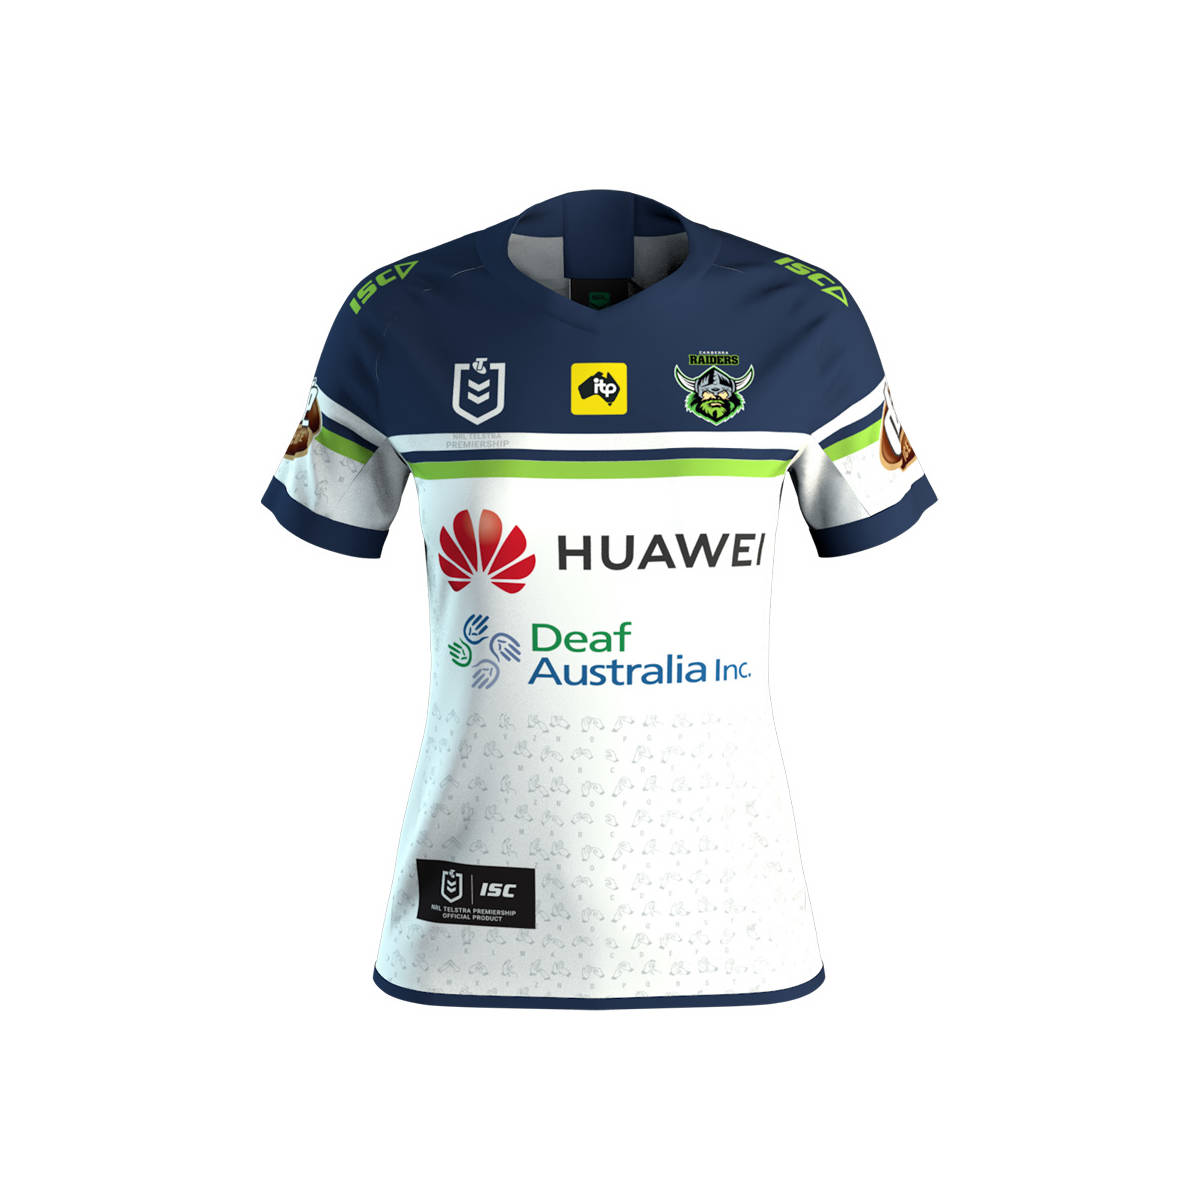 2019 Raiders Ladies Huawei Charity Jersey0